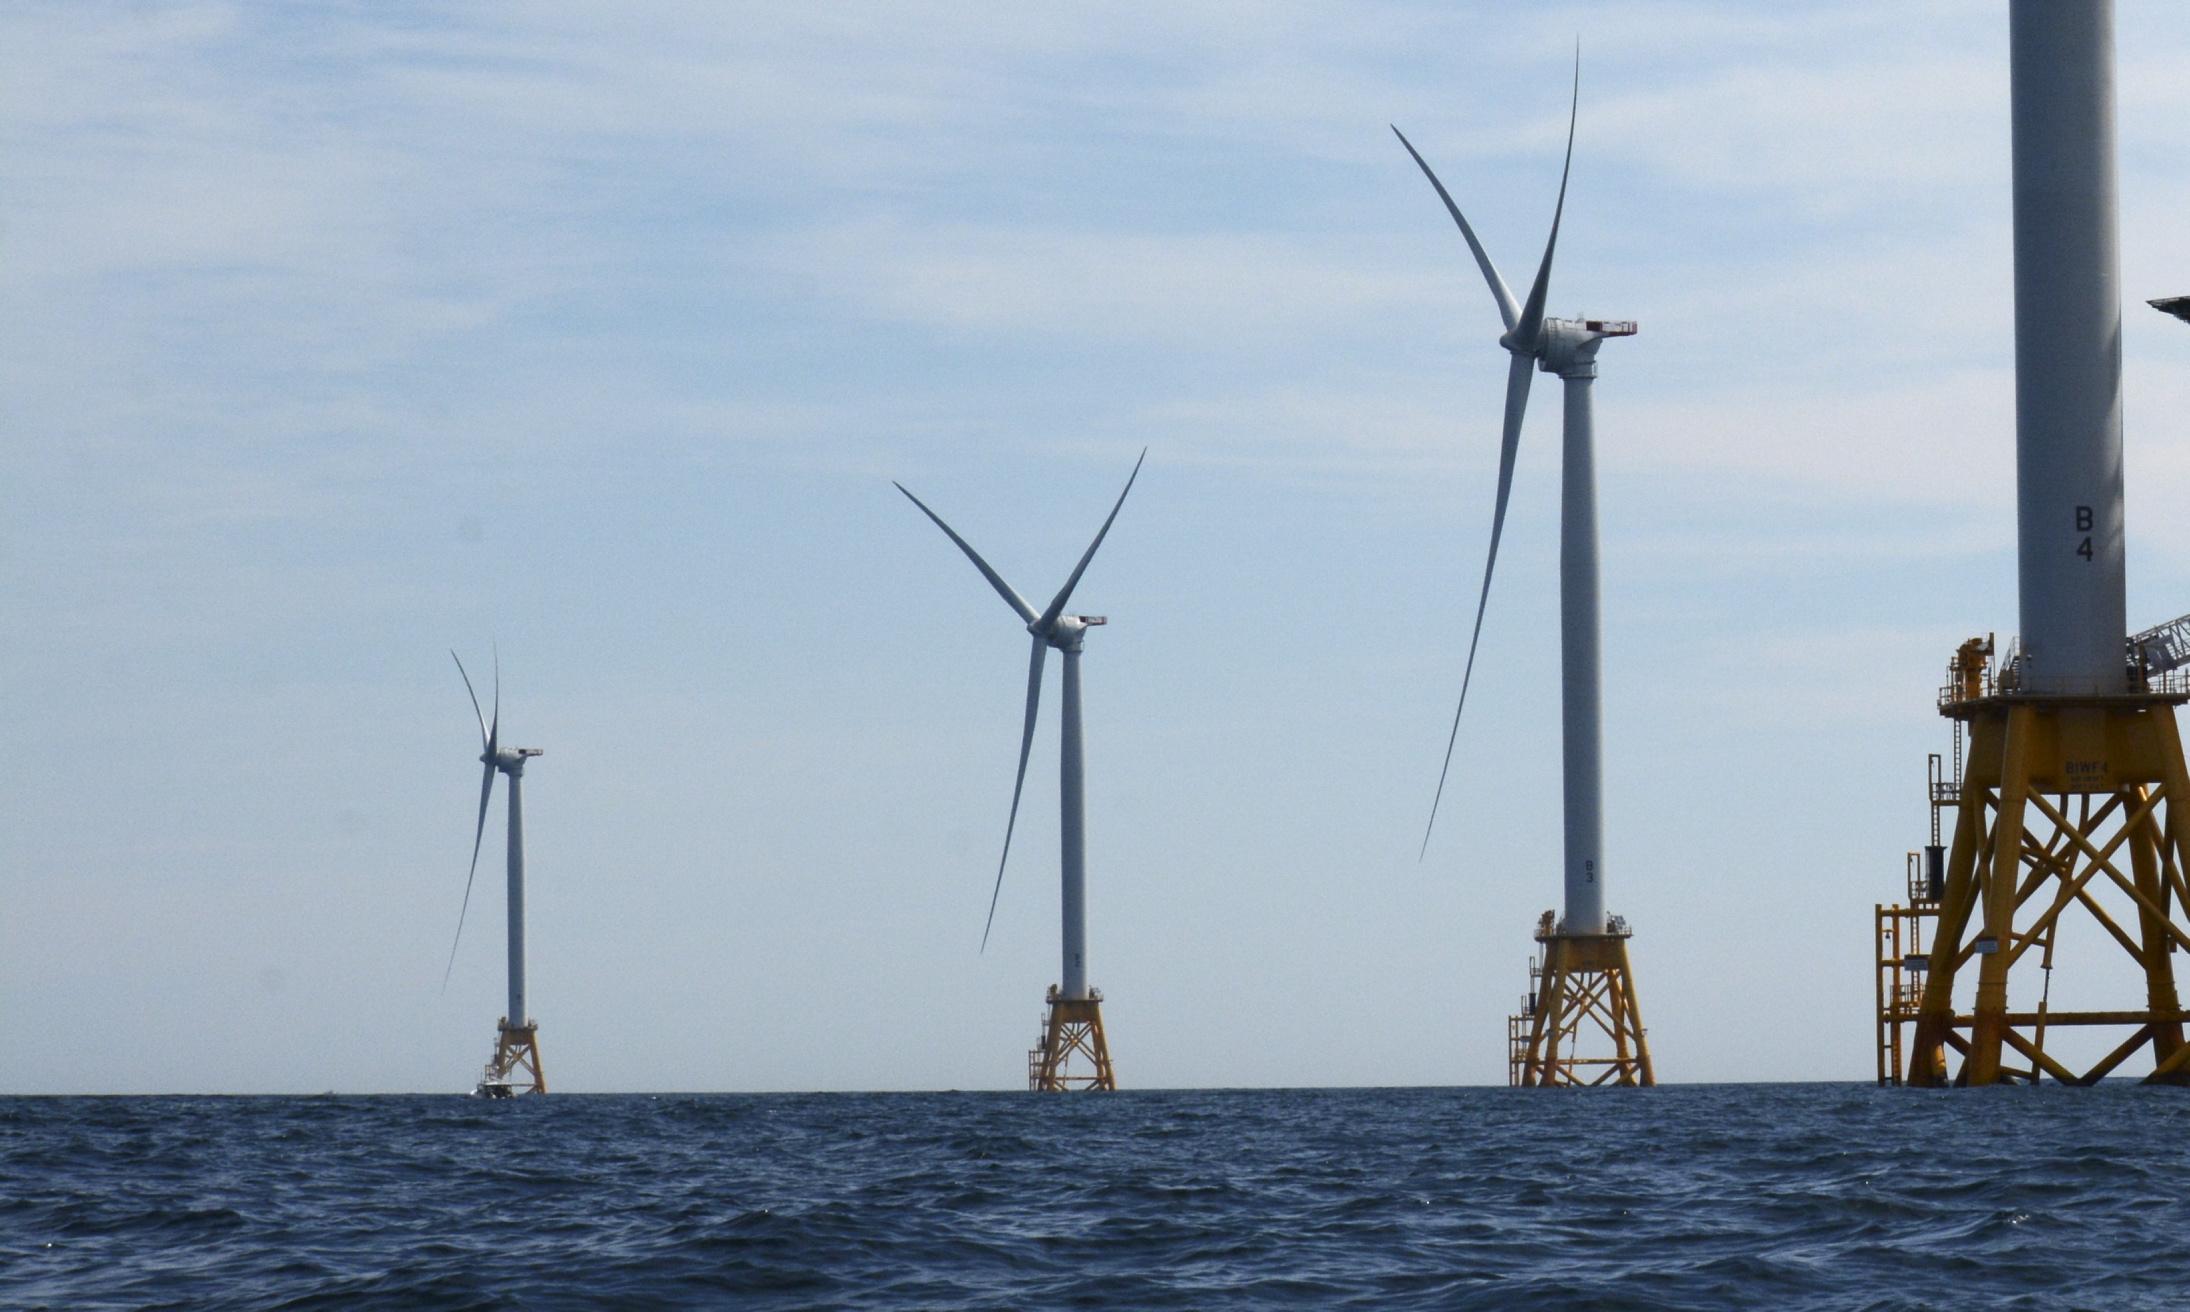 Deepwater wind farm off Block Island, Rhode Island